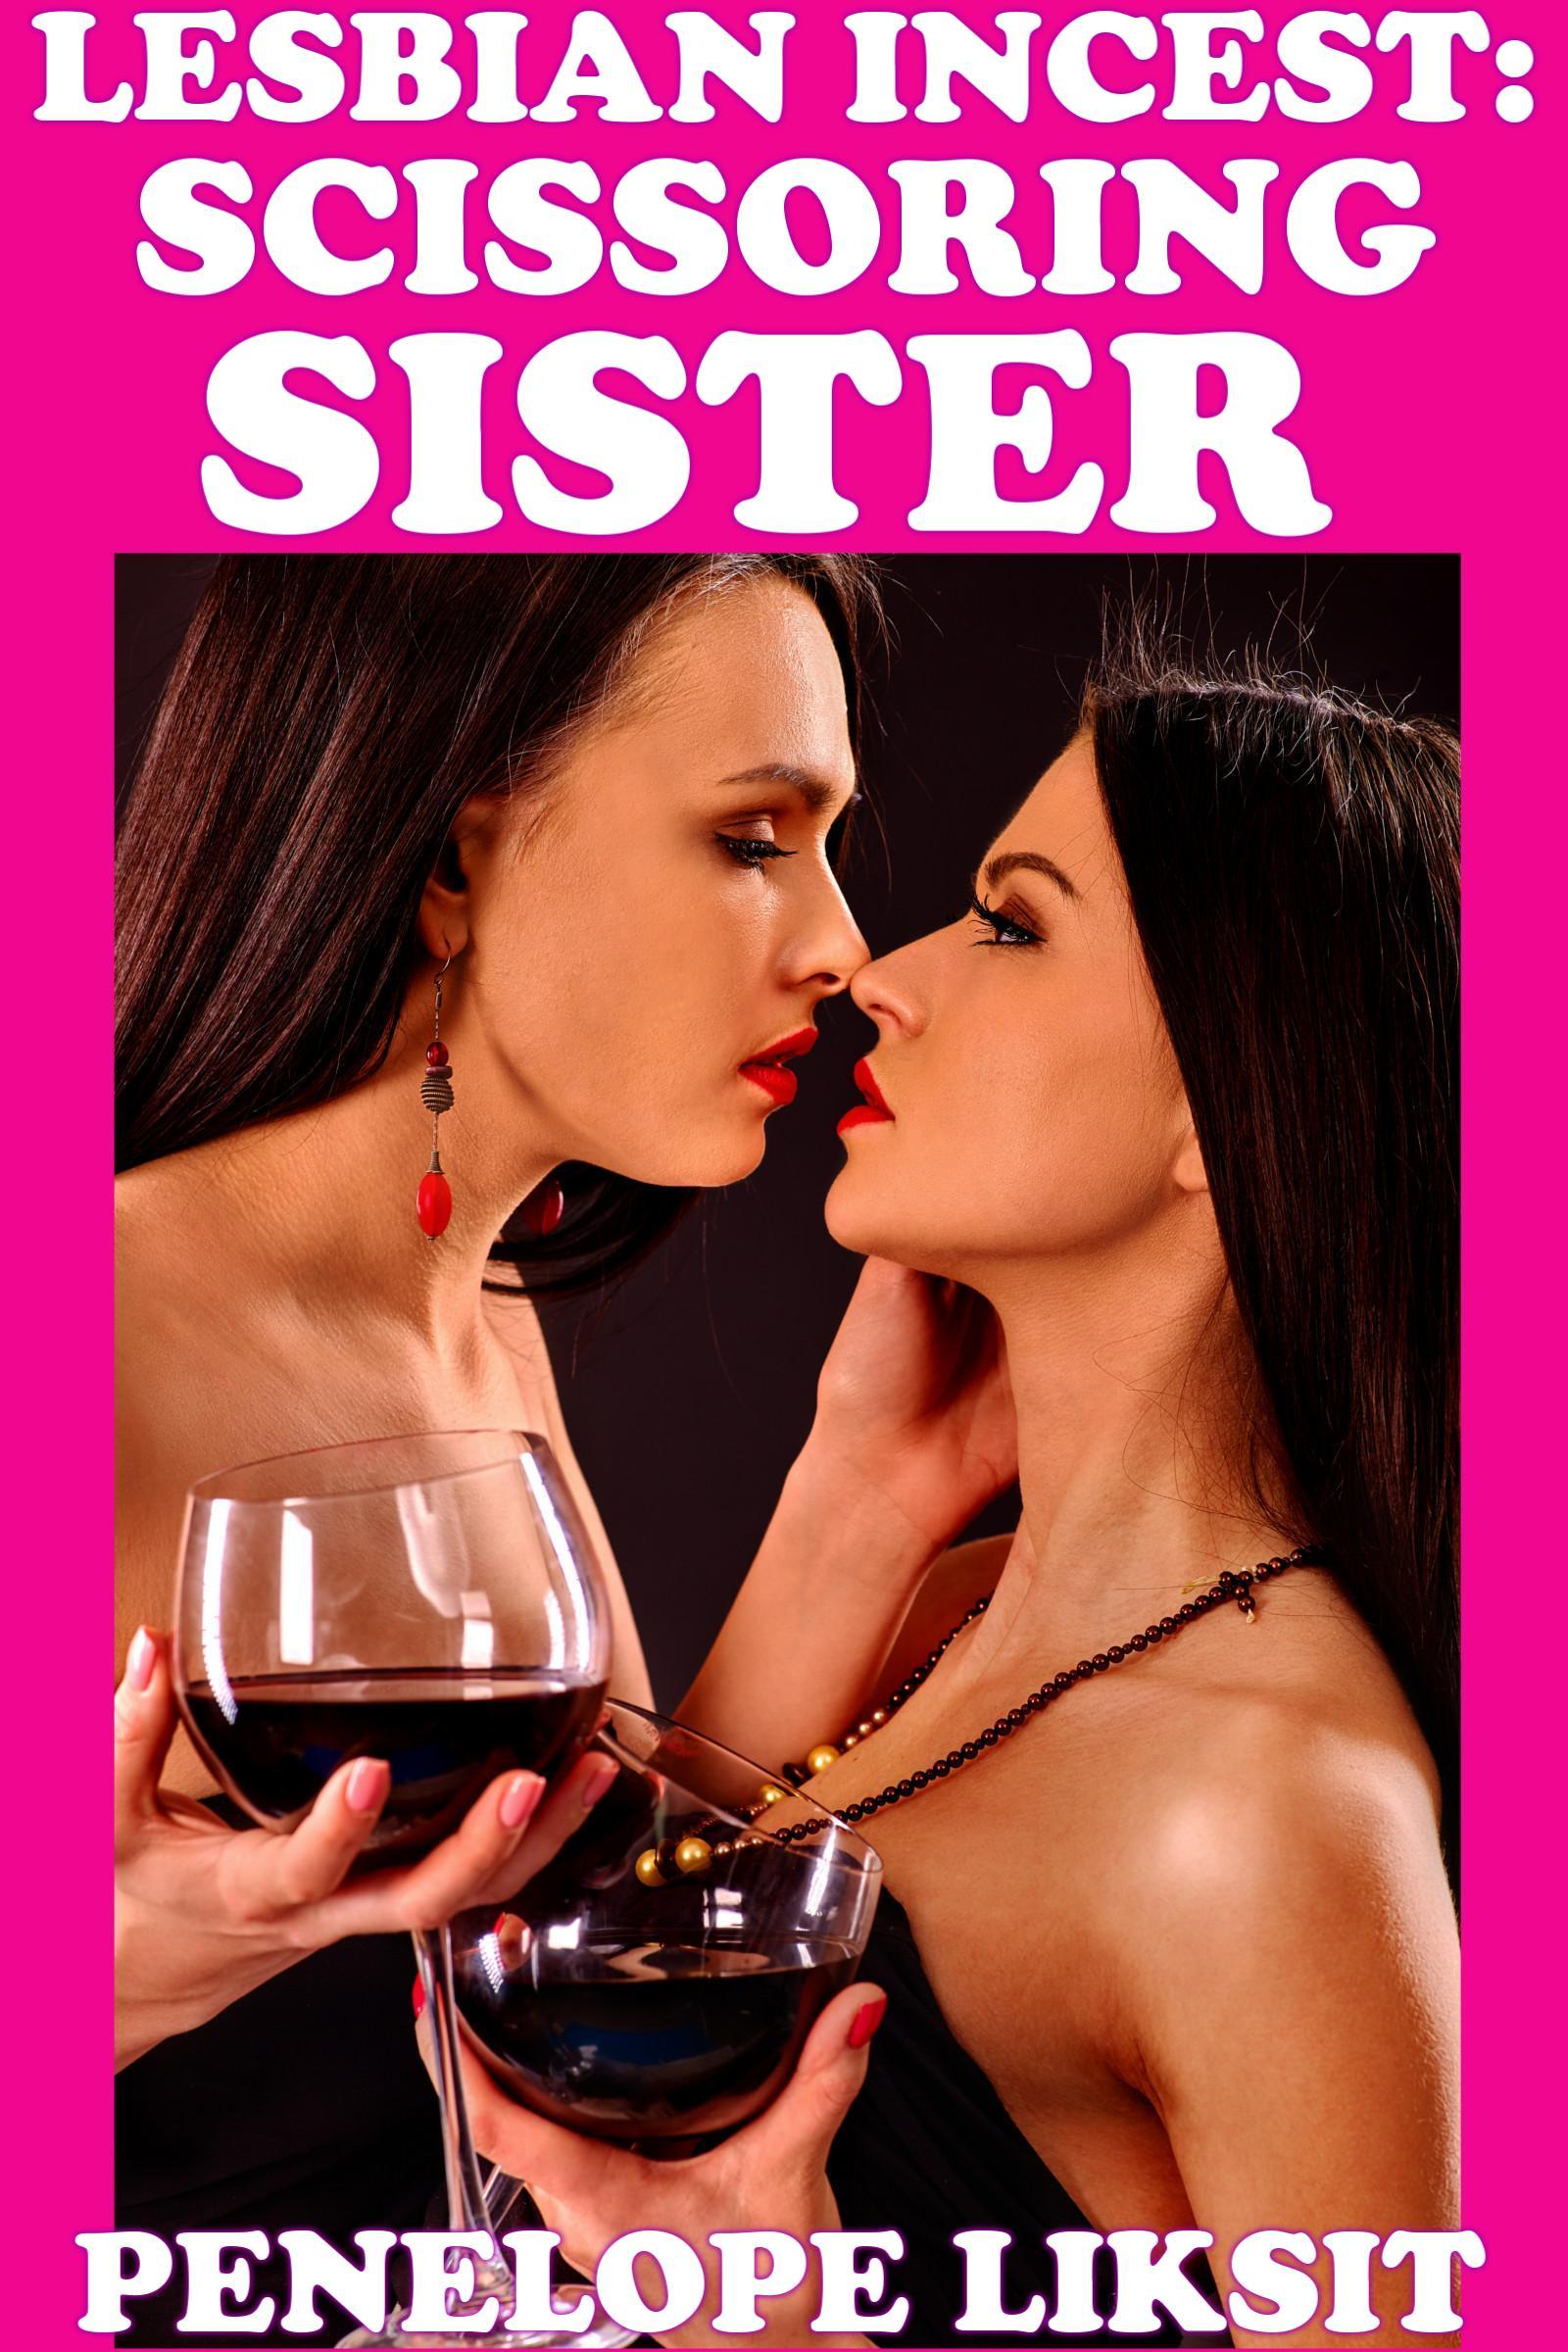 Lesbian insest erotica